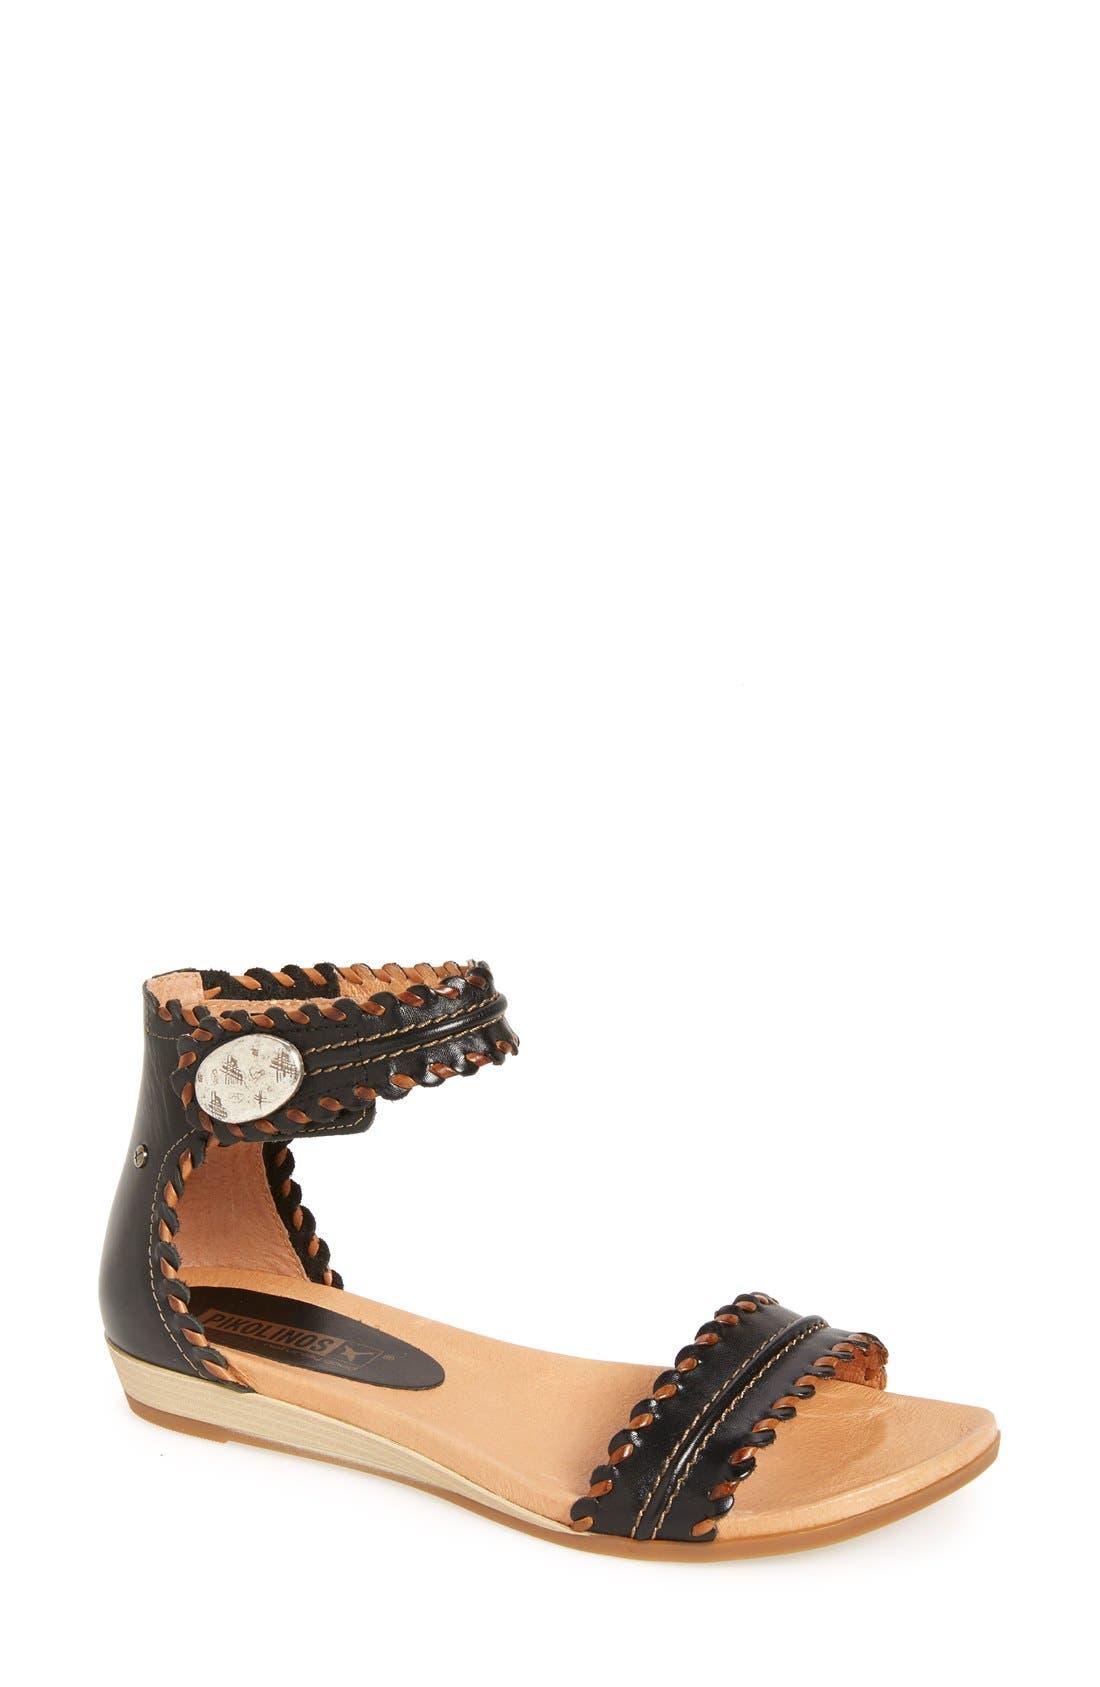 'Alcudia' Ankle Strap Sandal,                         Main,                         color, 001